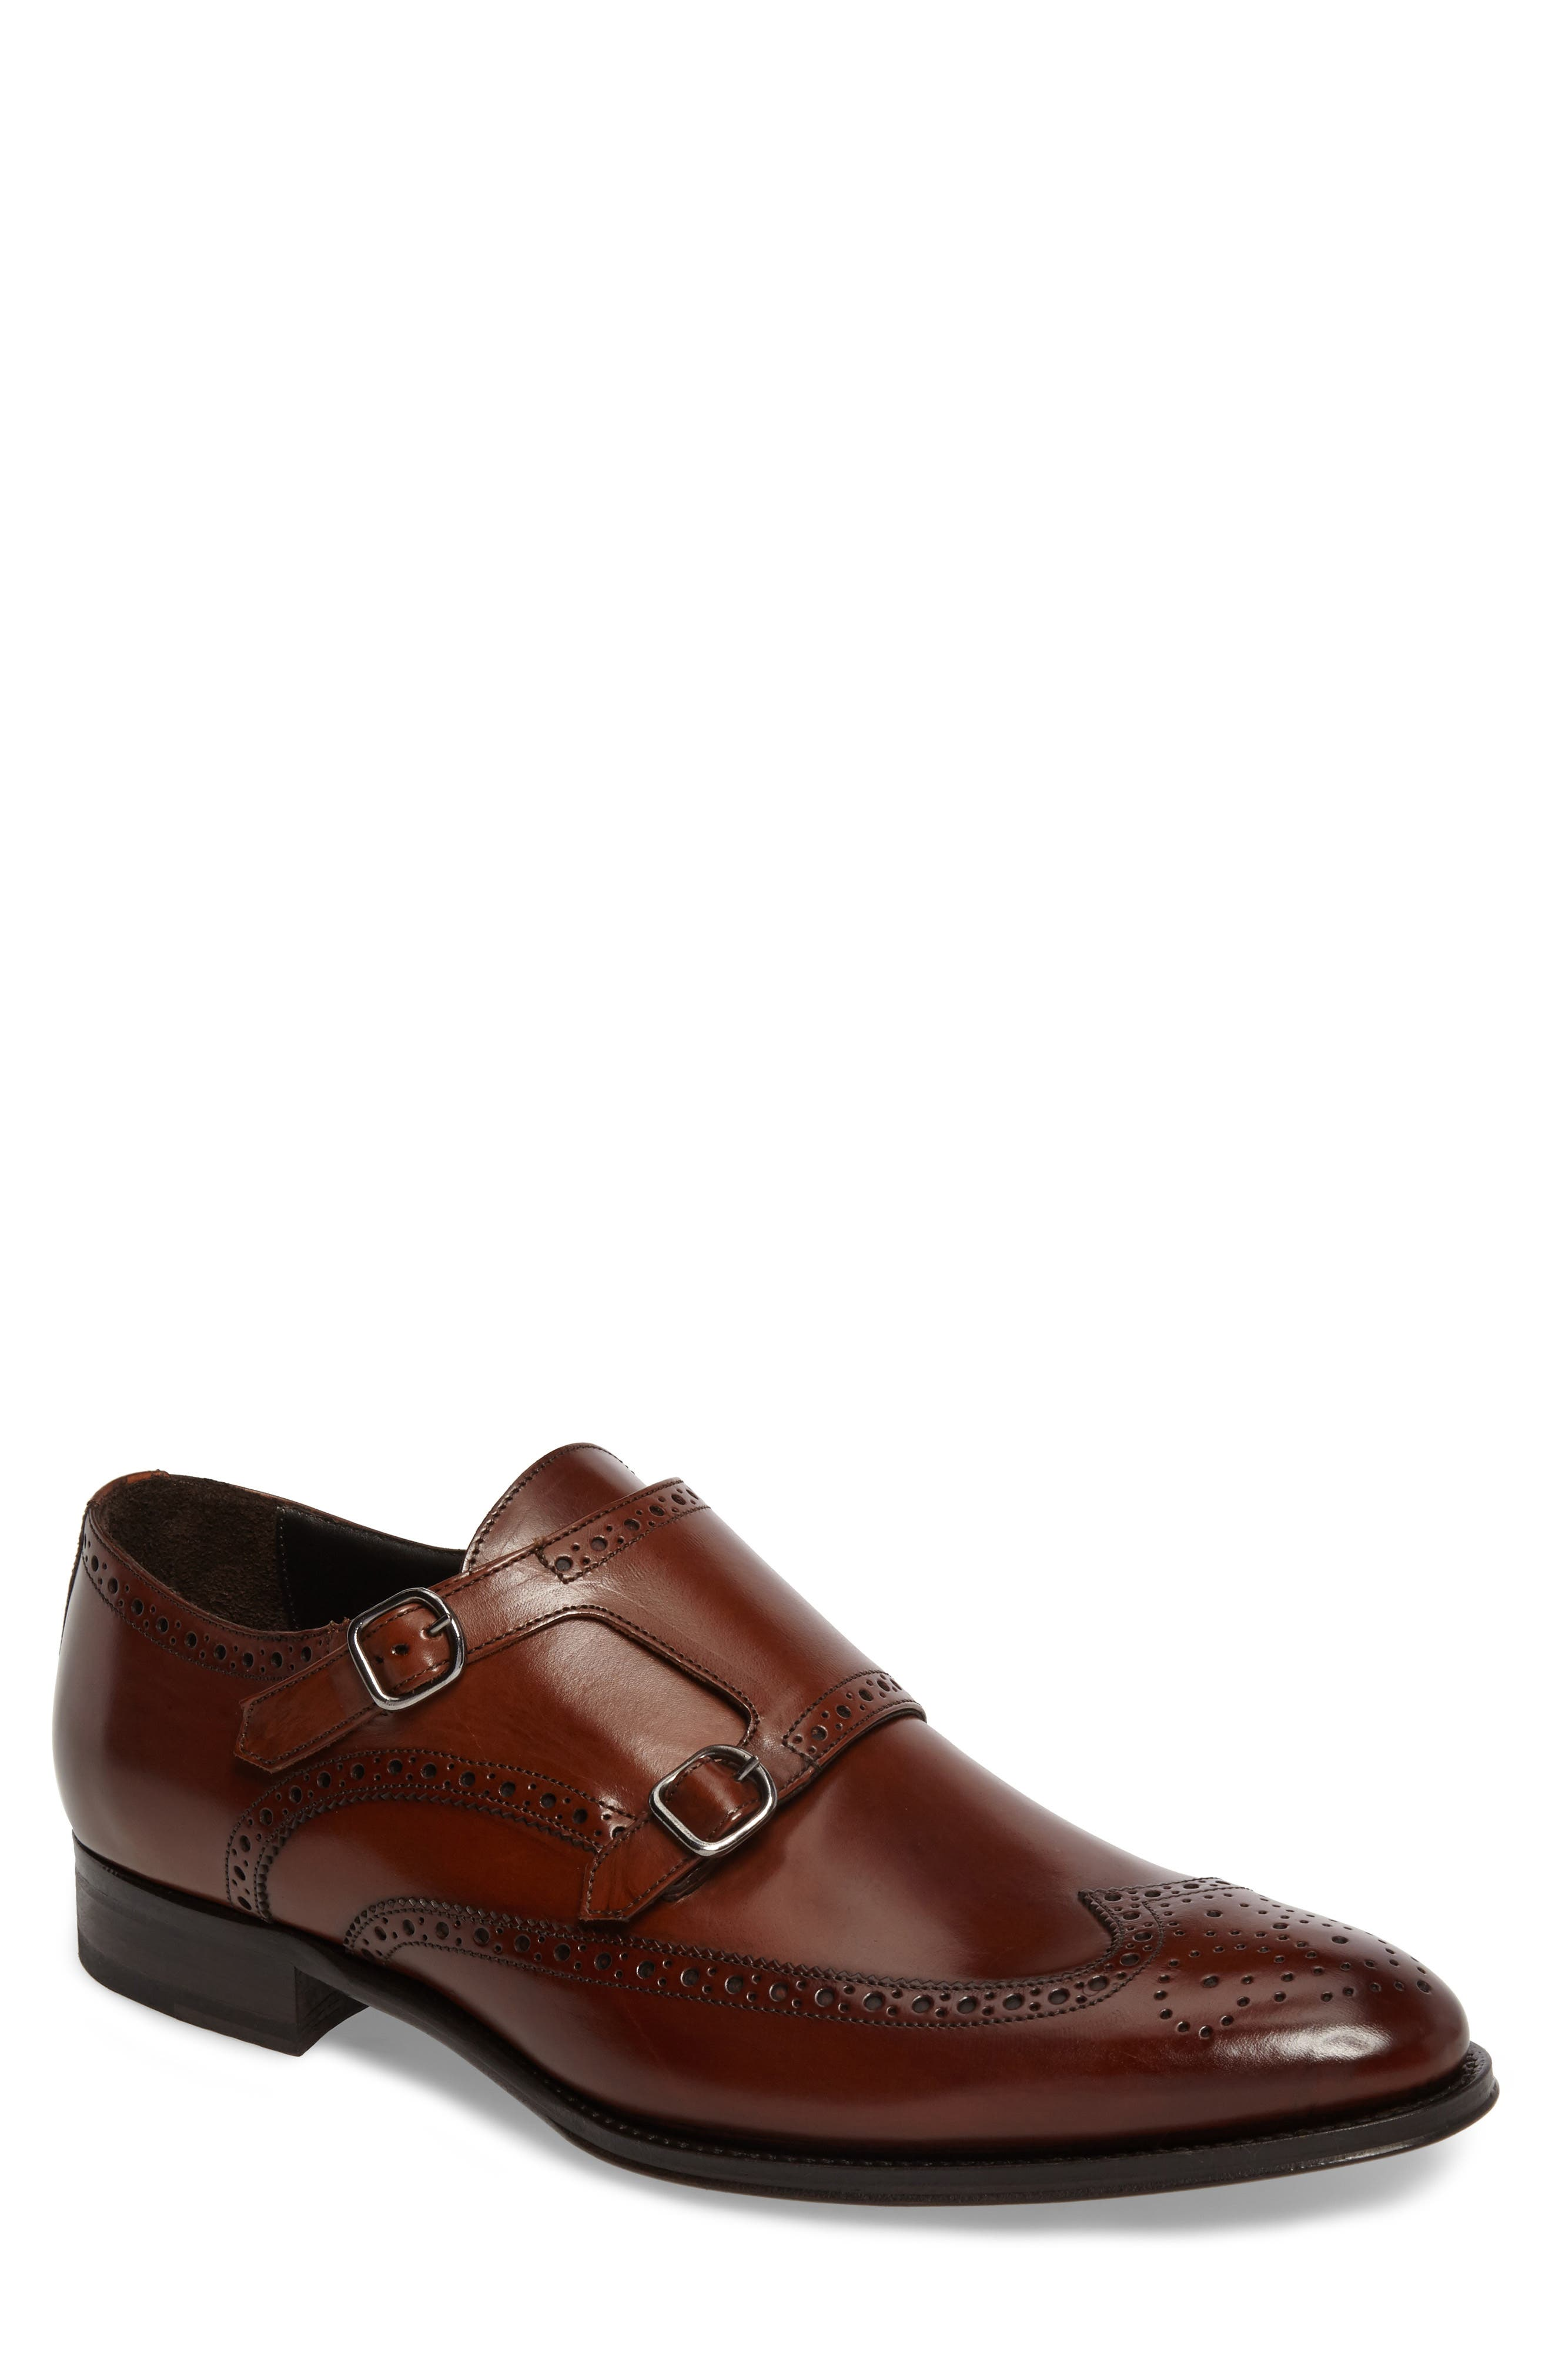 Pike Double Monk Strap Shoe,                             Main thumbnail 1, color,